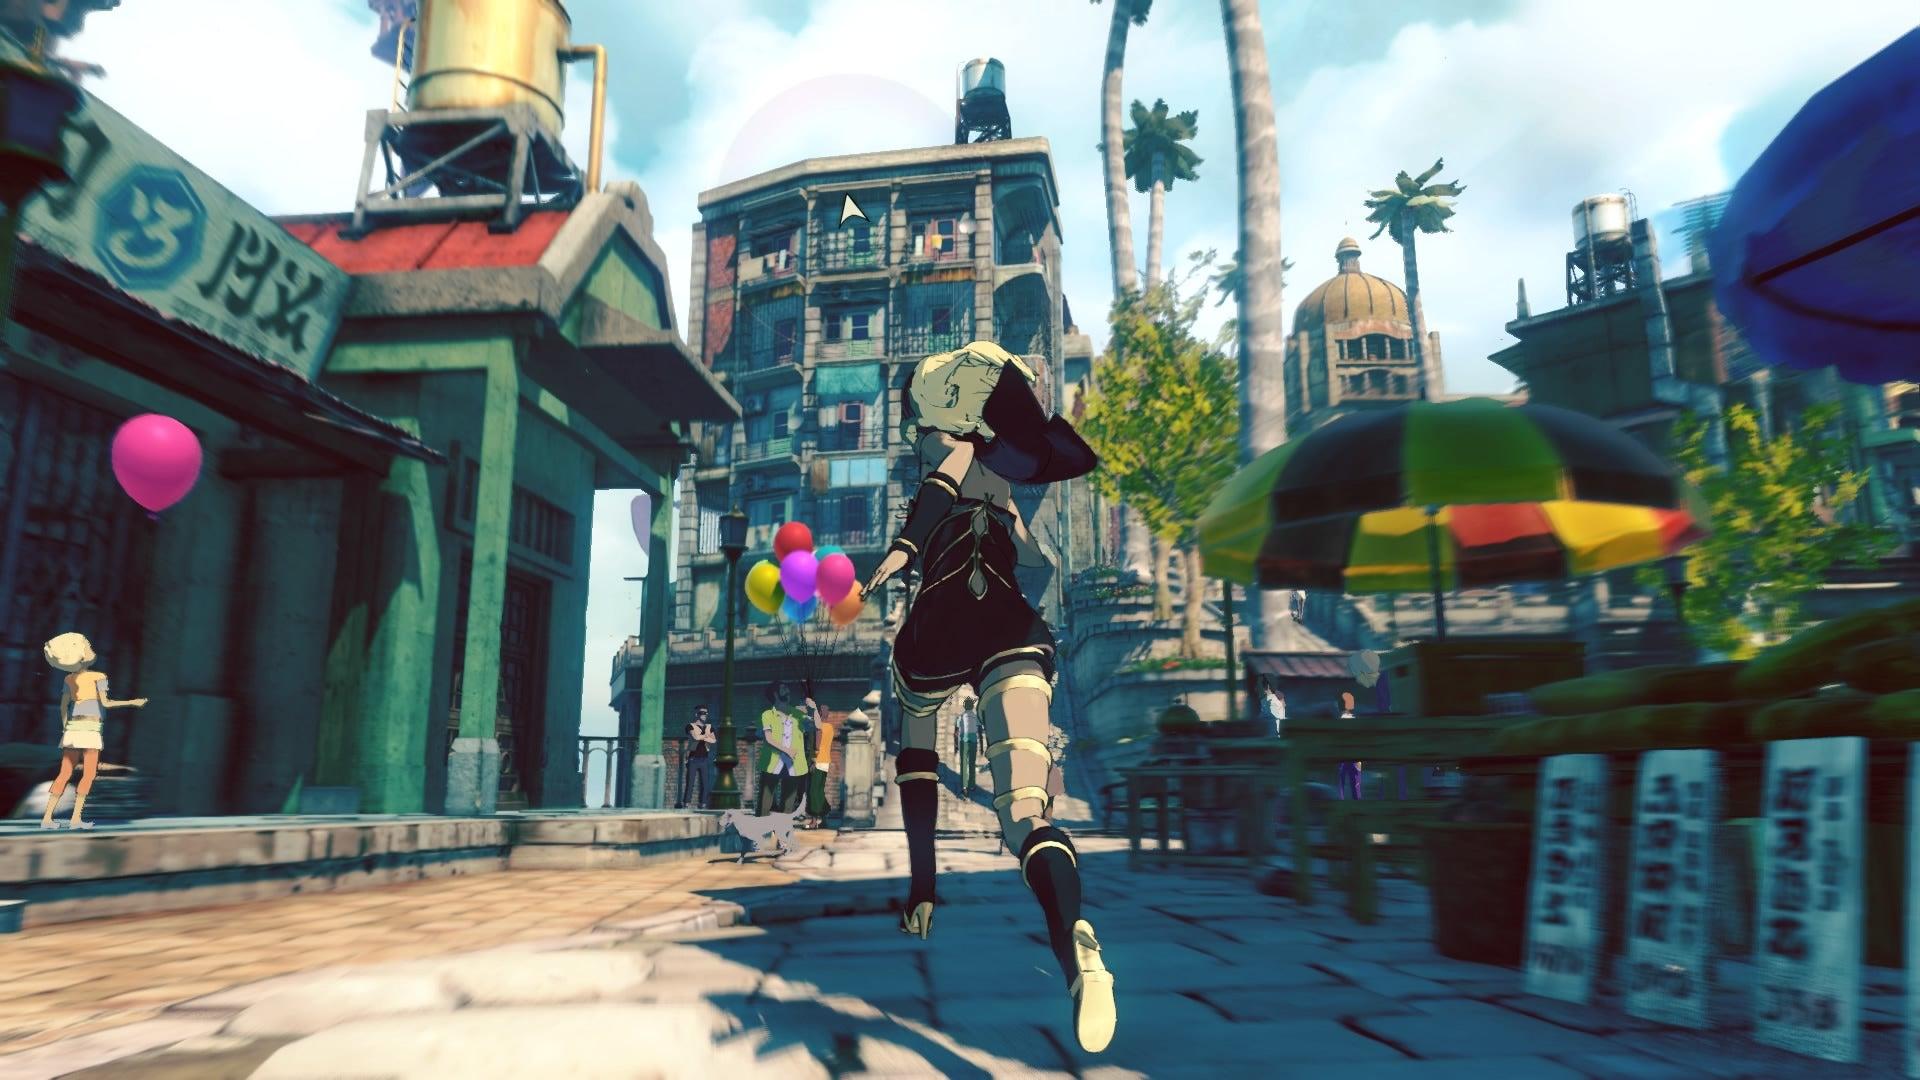 Gravity Rush 2 Players Race To Unlock Items Ahead Of Server Shutdown